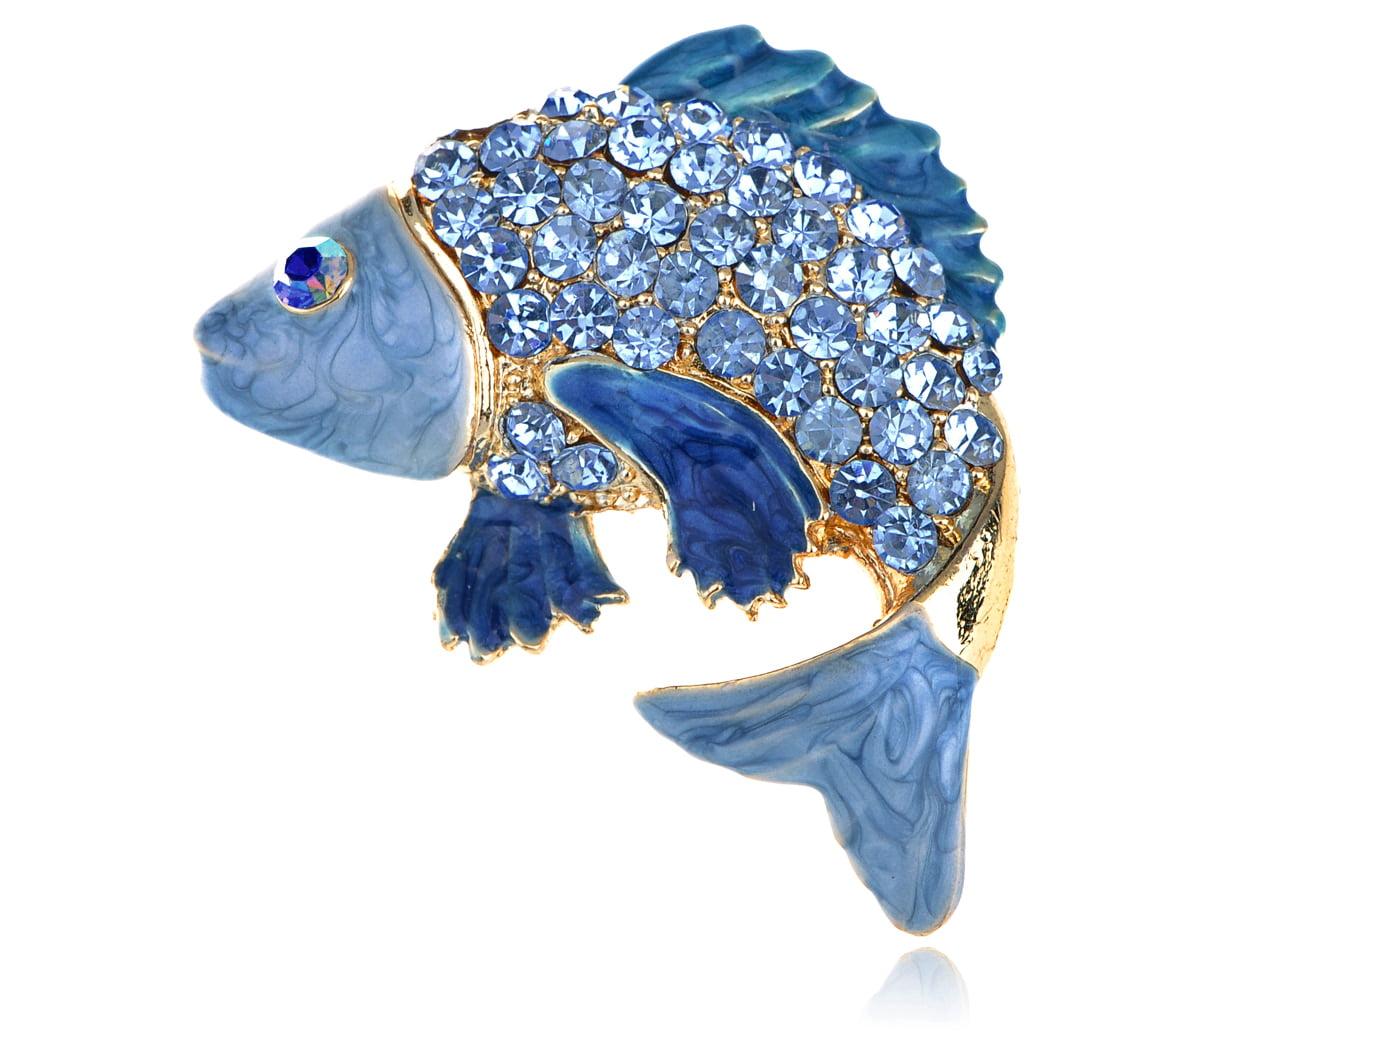 Sapphire Aqua Crystal Rhinestone Enamel Golden Carp Koi Fish Fashion Pin Brooch by